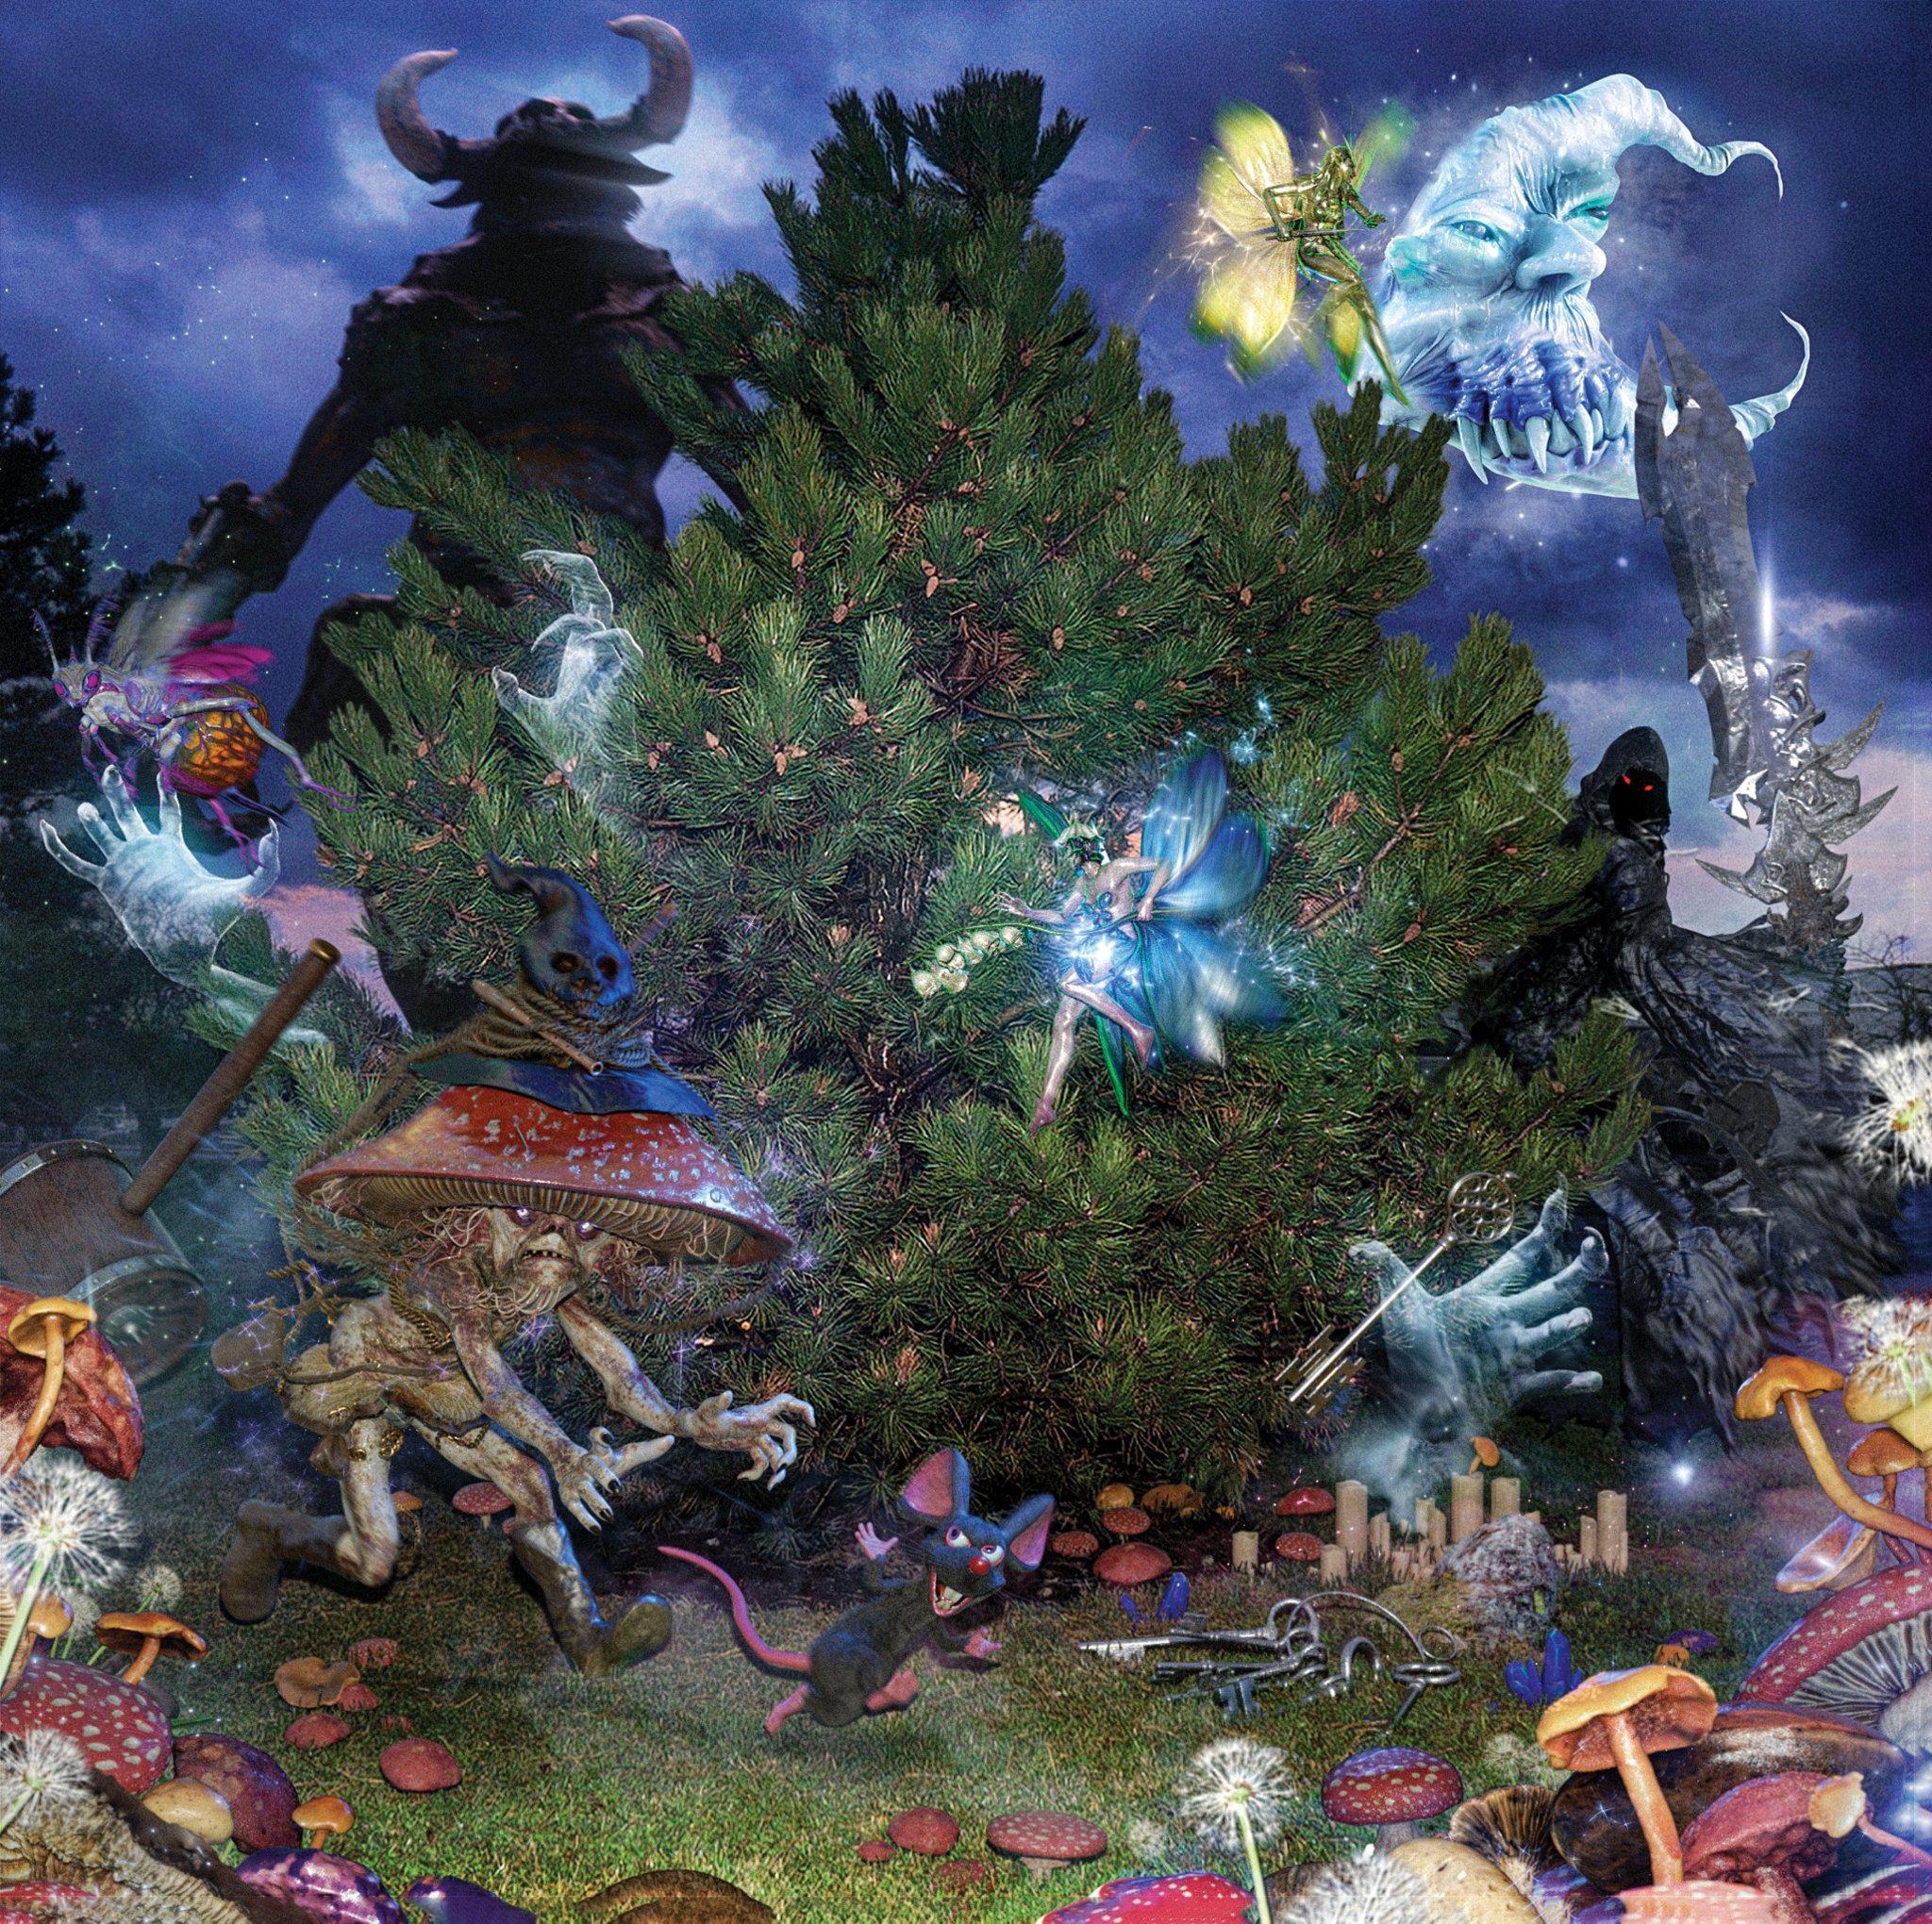 100 Gecs – '1000 Gecs & the Tree of Clues'